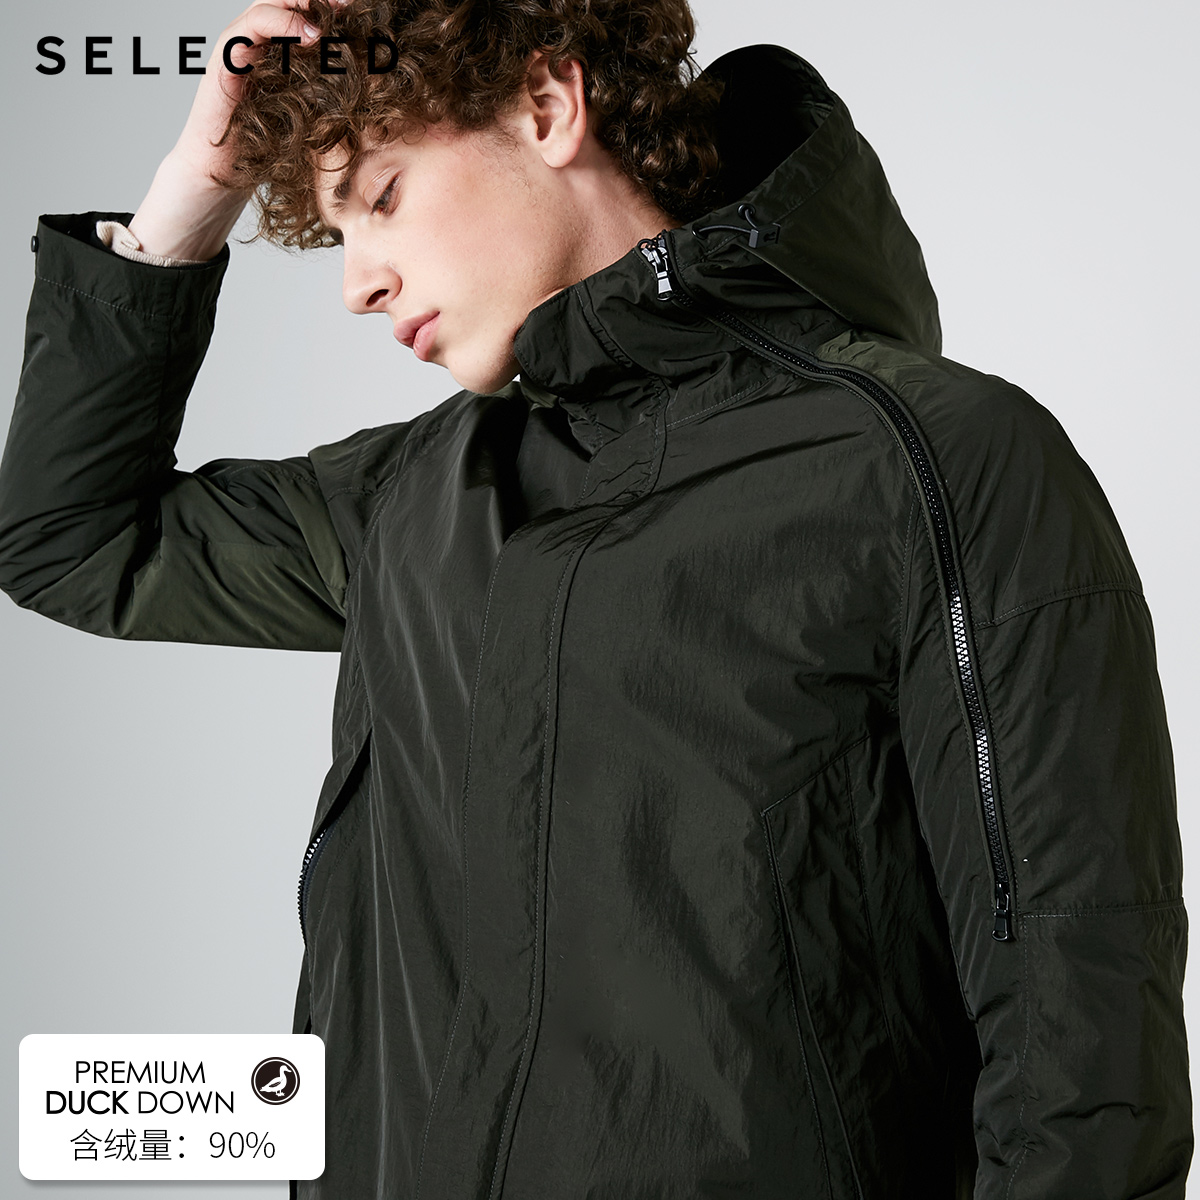 Sportswear 100 cotton Tracksuits hoodies Sweatshirts sportsuit Mens Jacket Embroidery